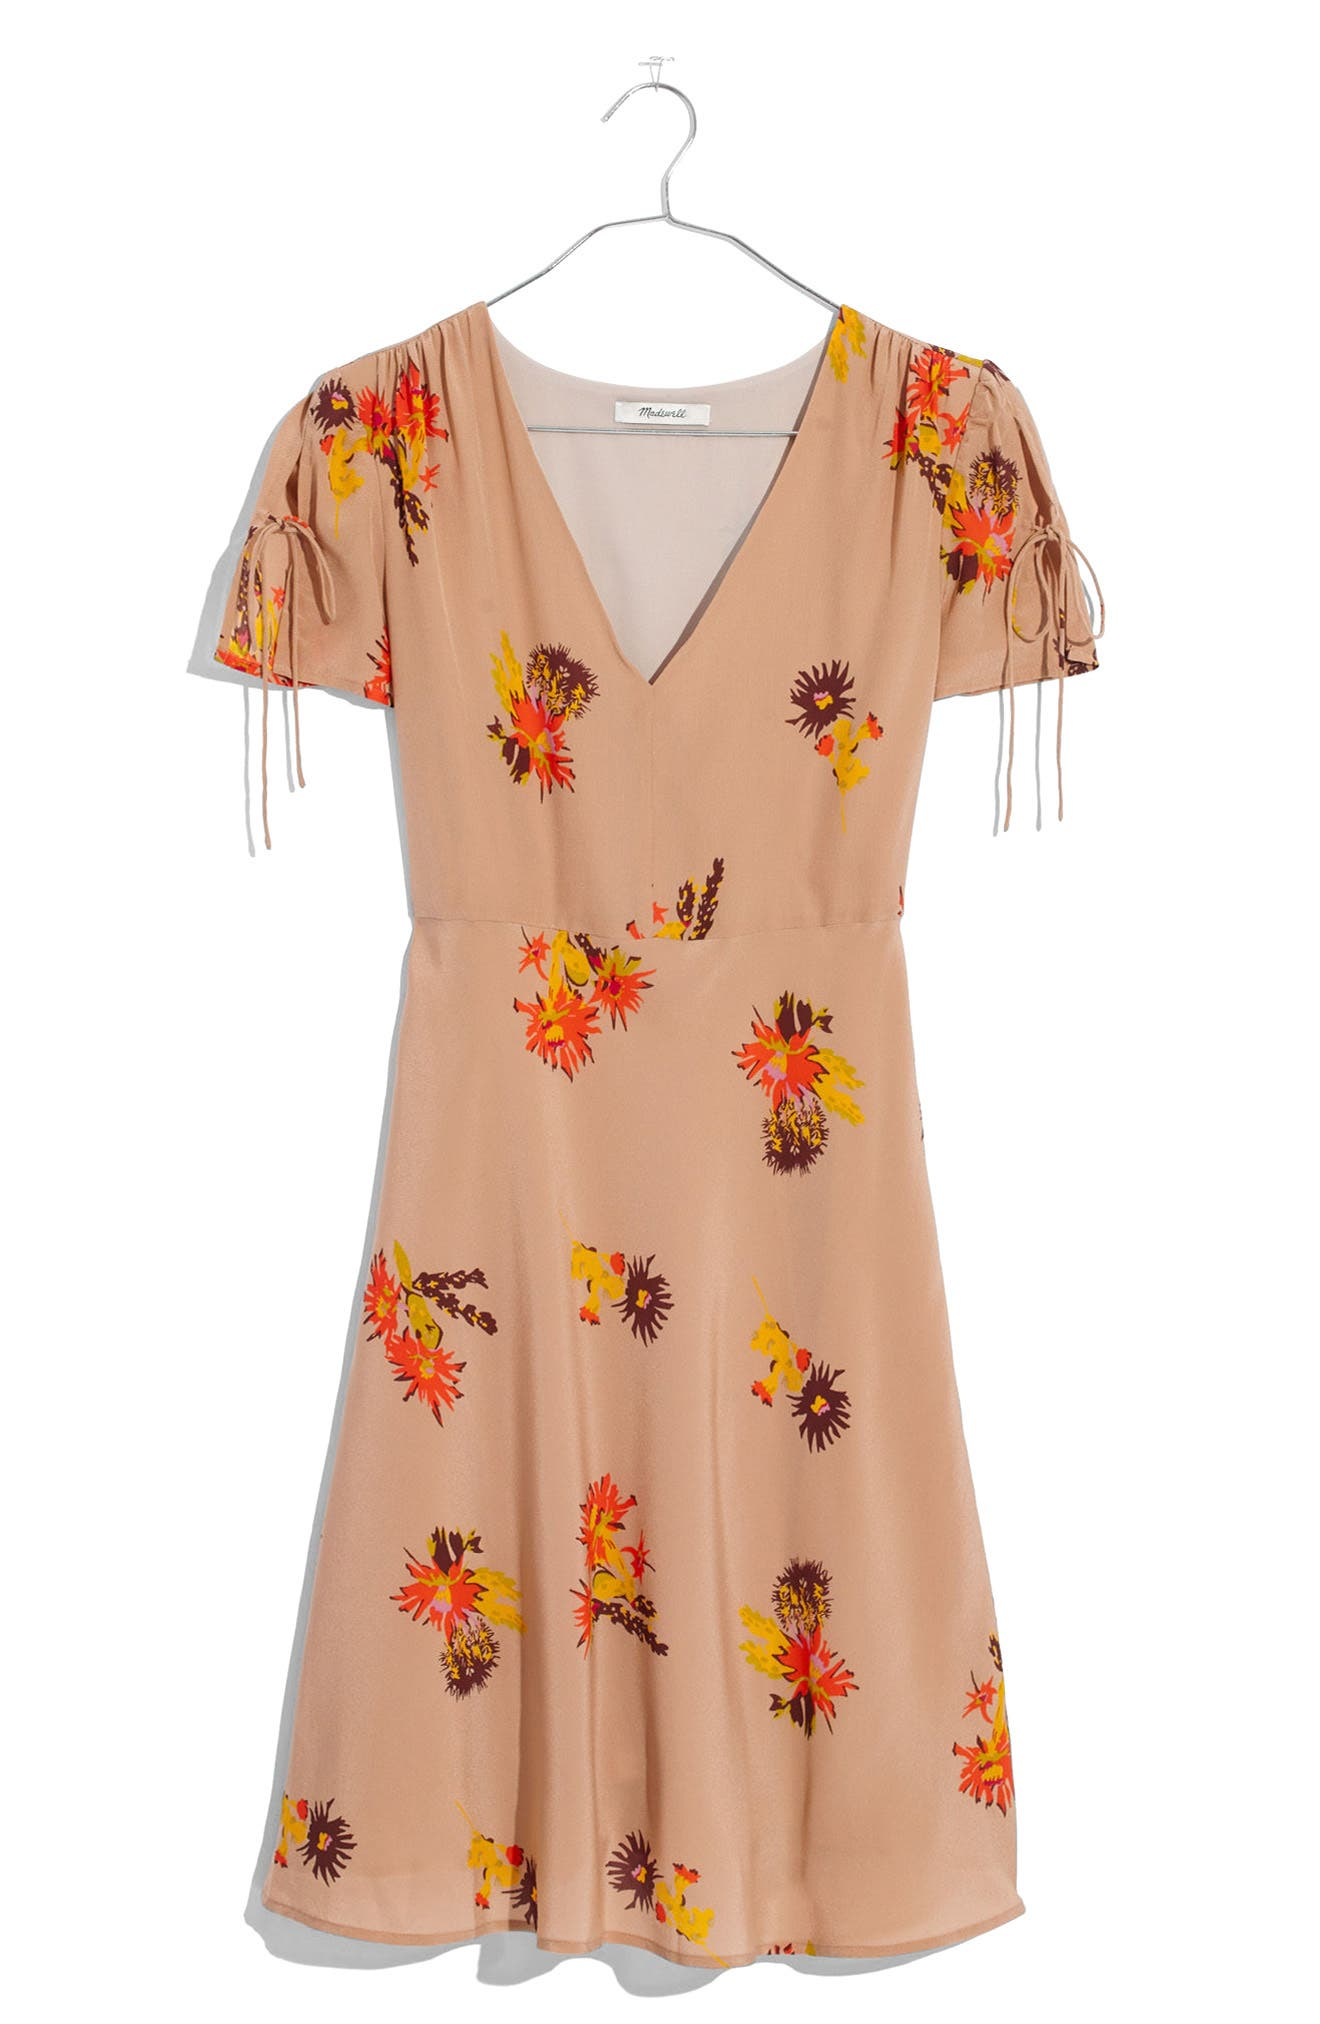 Main Image - Madewell Cactus Flower Silk Dress